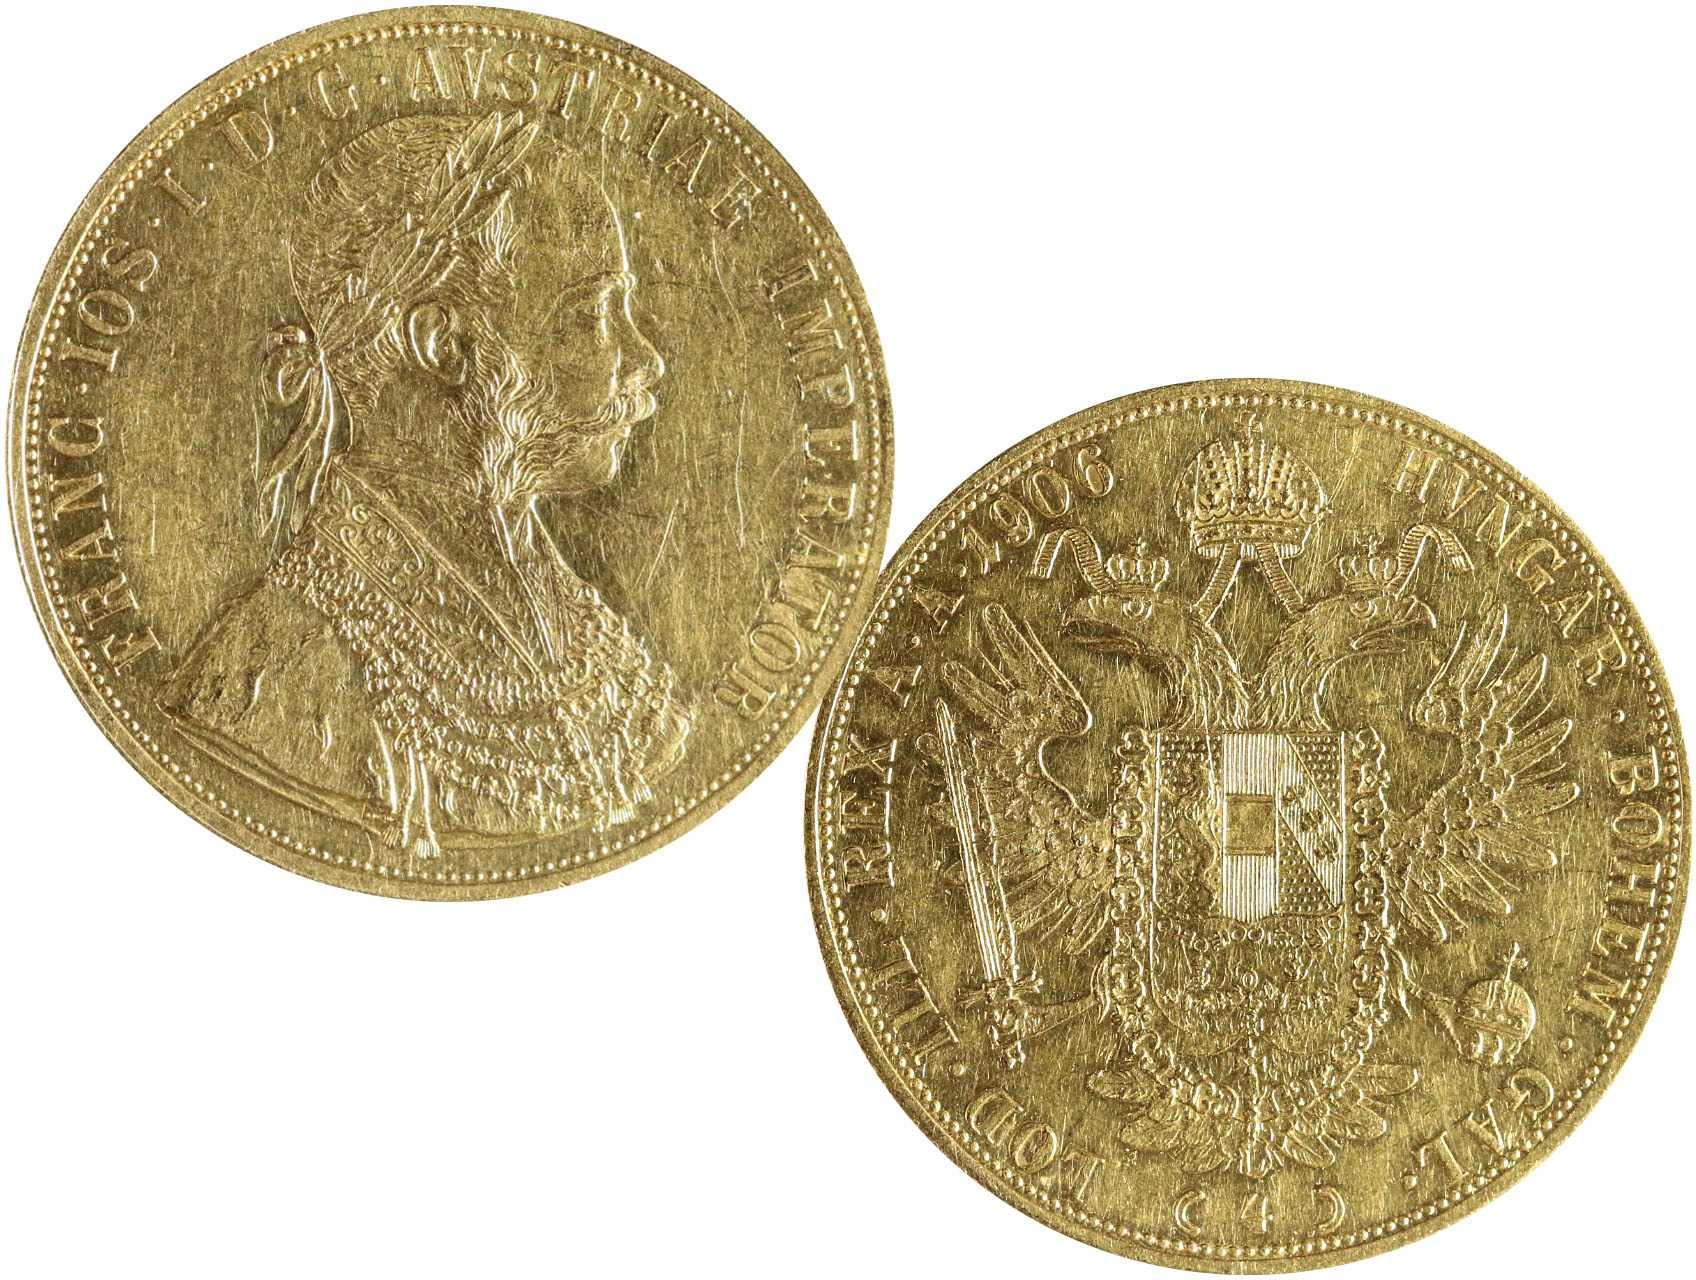 František Josef I. 1848-1916 - 4 Dukát 1906, N117